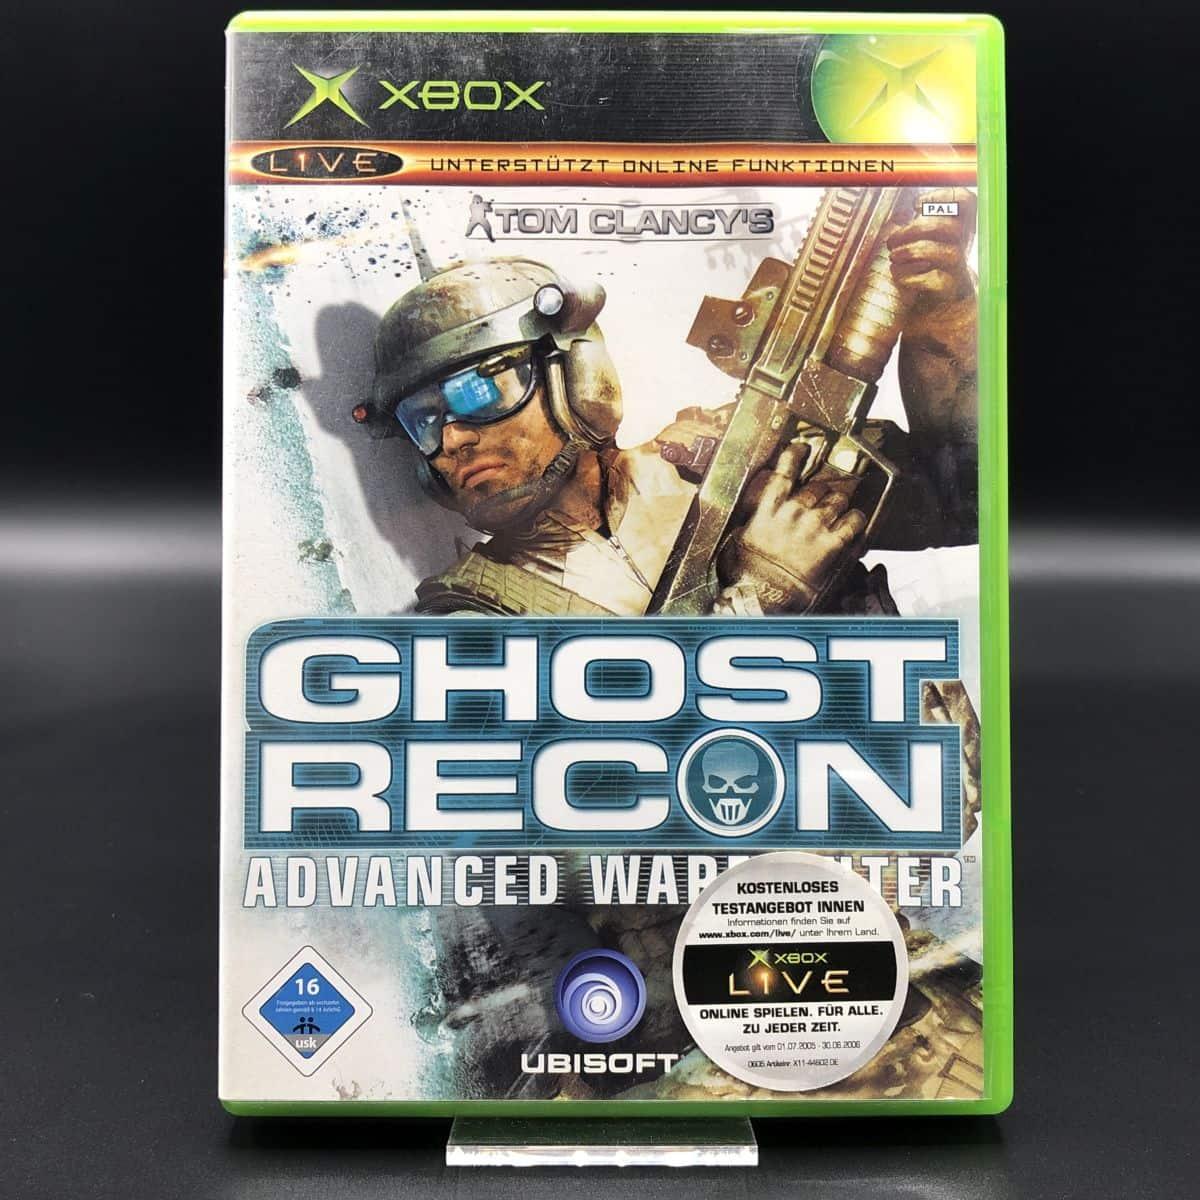 XBC Tom Clancy's Ghost Recon: Advanced Warfighter (Komplett) (Gut) Microsoft Xbox Classic